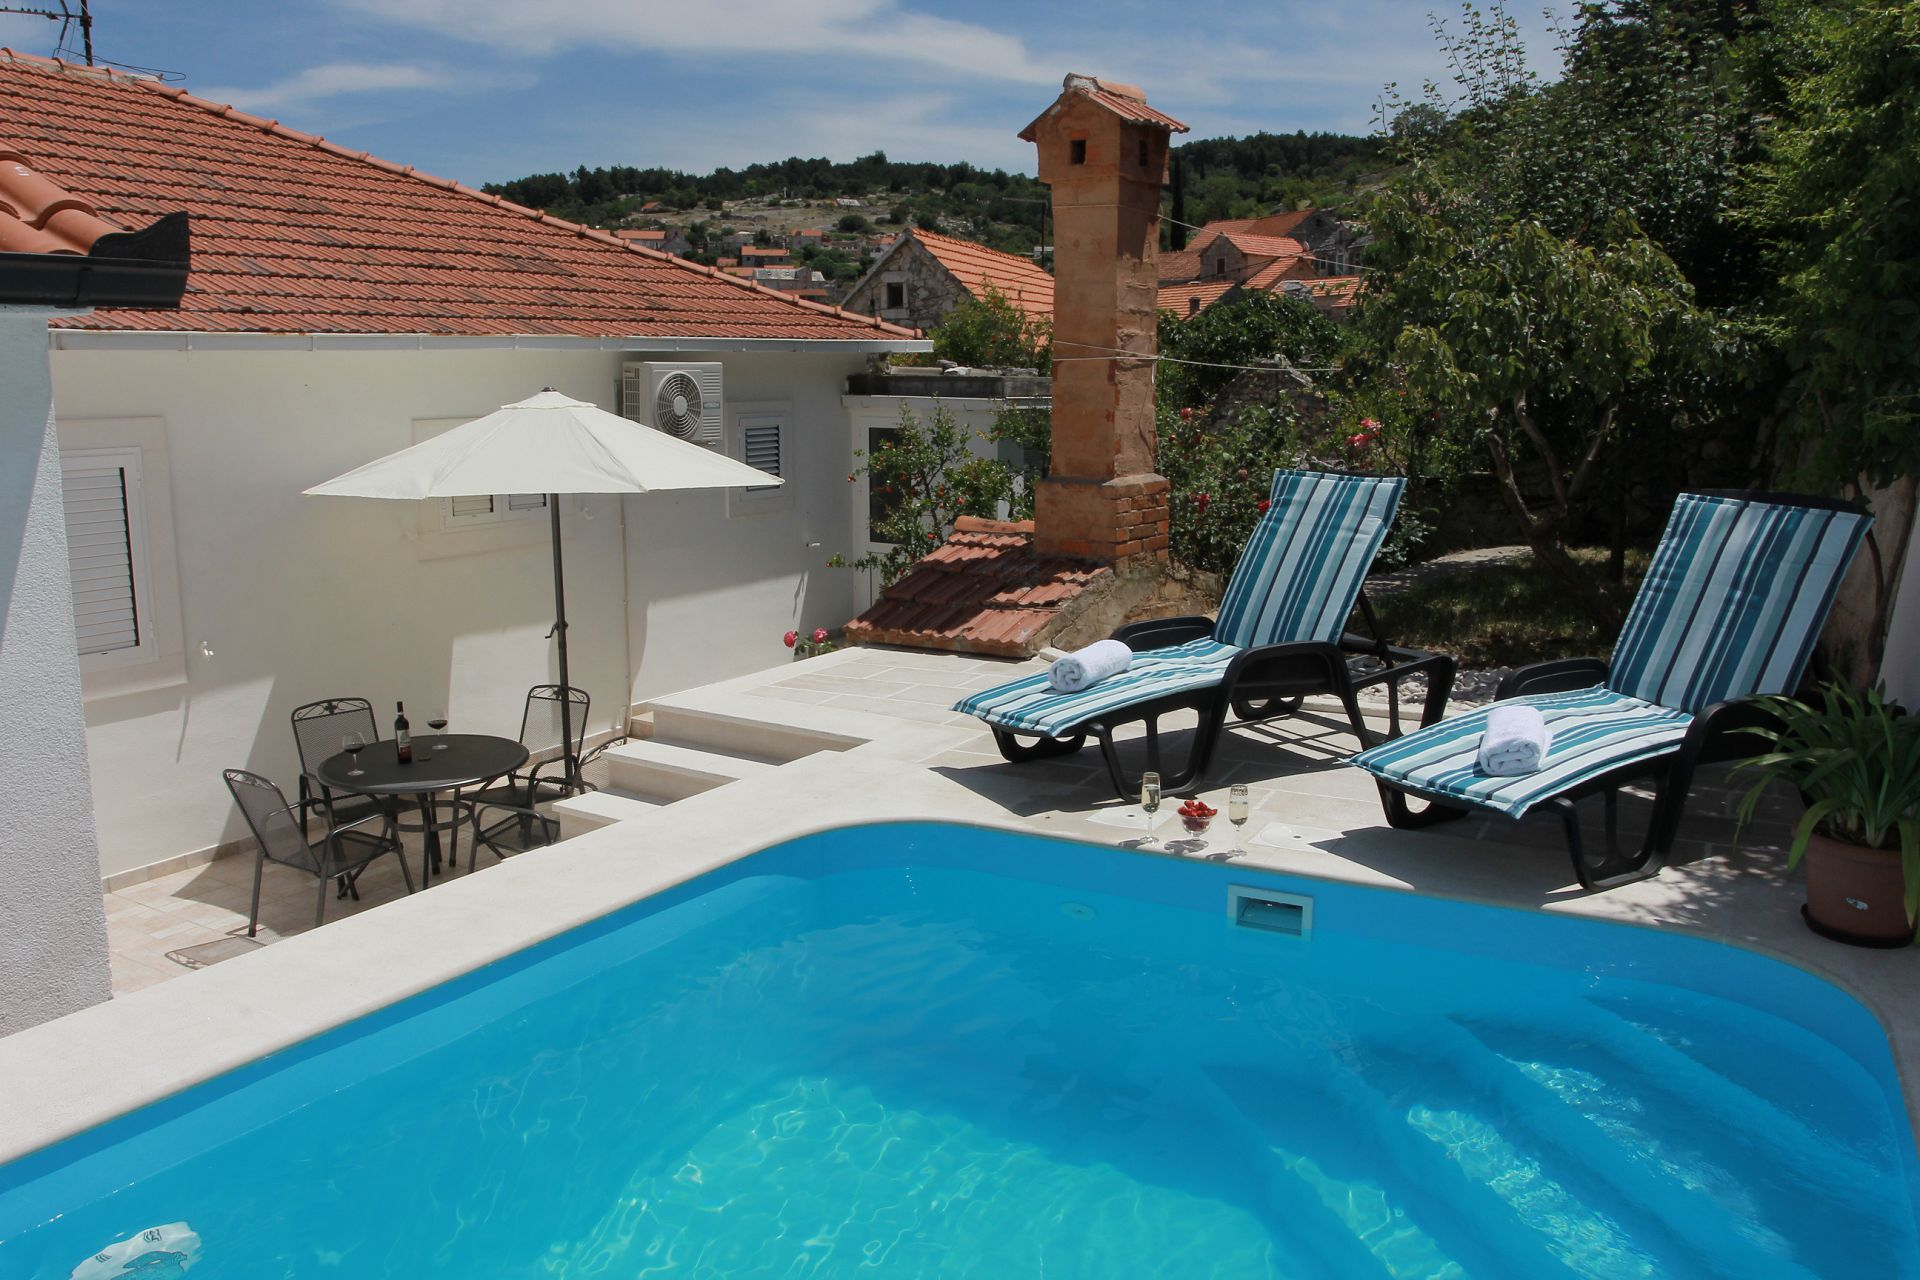 8217 - Nerezisca - Ferienhäuser, Villen Kroatien